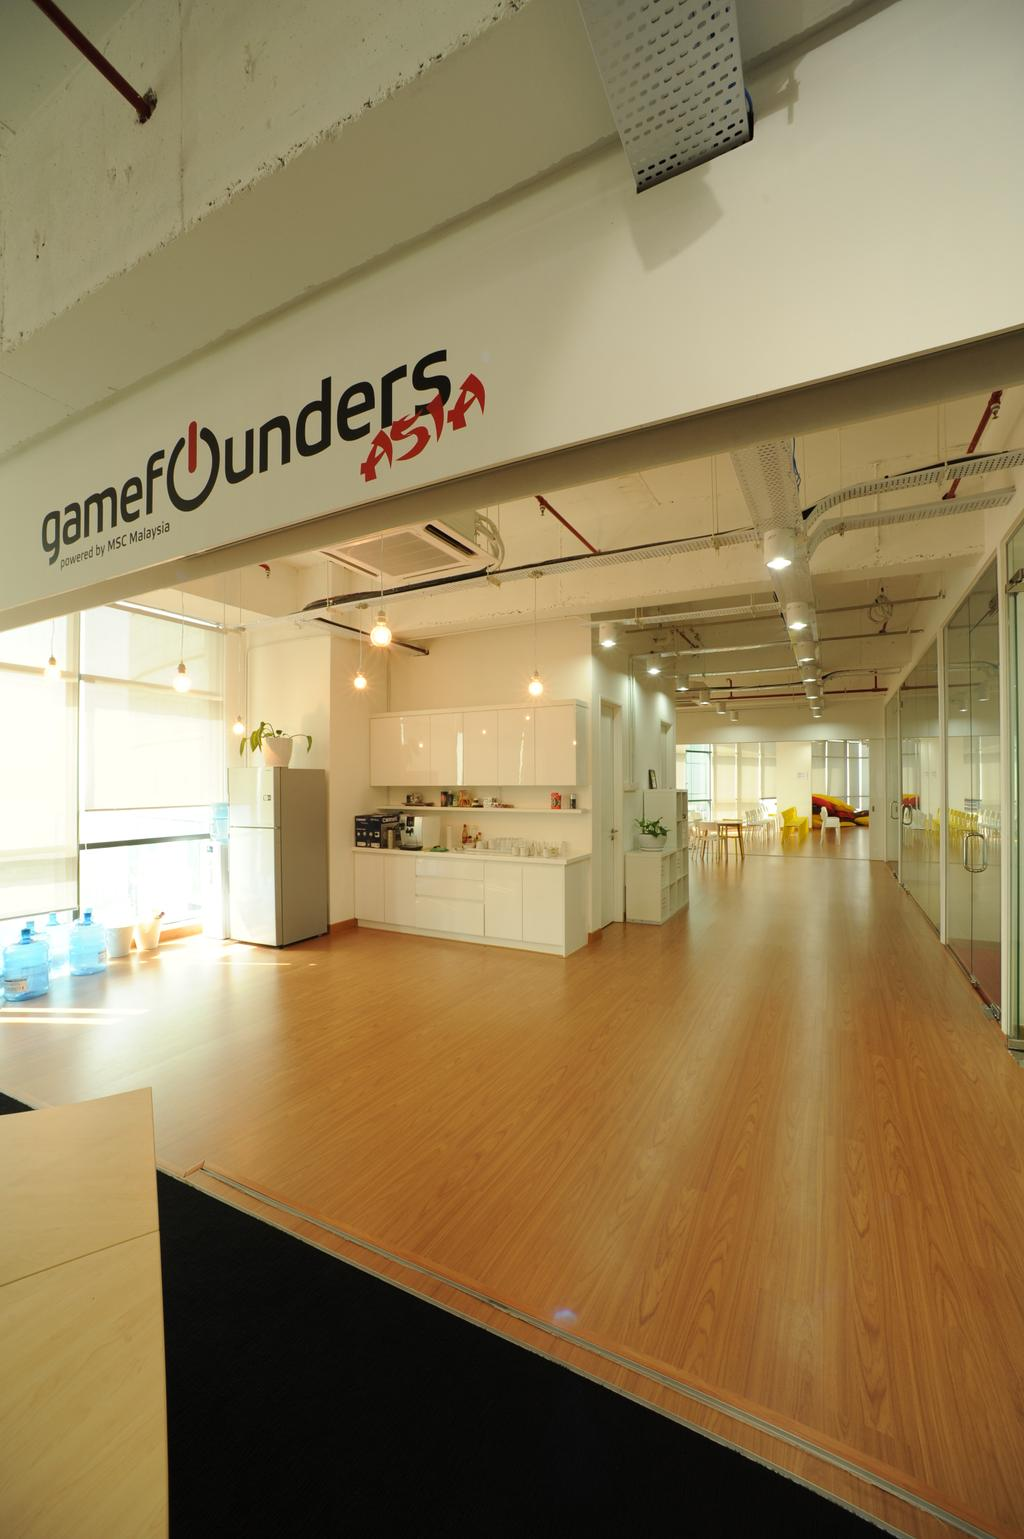 Vertical - Gamefounder, Commercial, Interior Designer, IQI Concept Interior Design & Renovation, Modern, Flooring